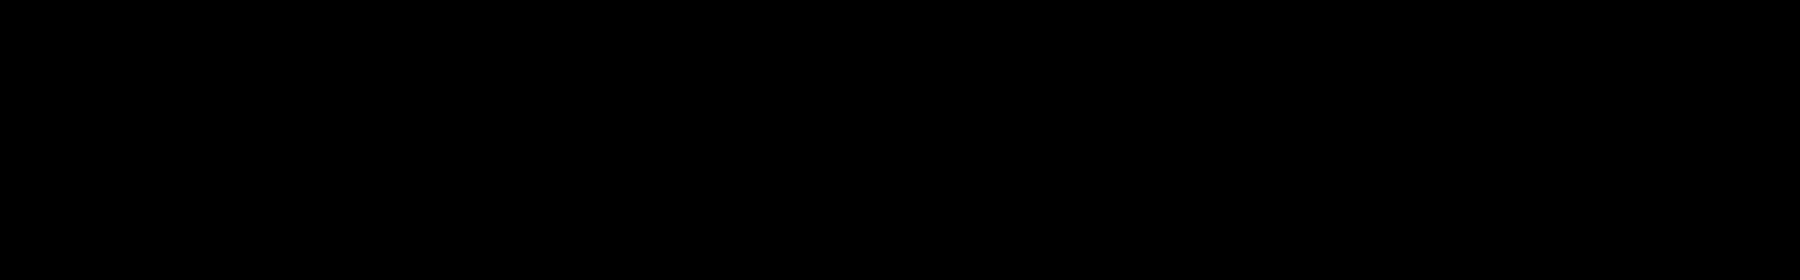 MPC 80's Chord Progressions audio waveform